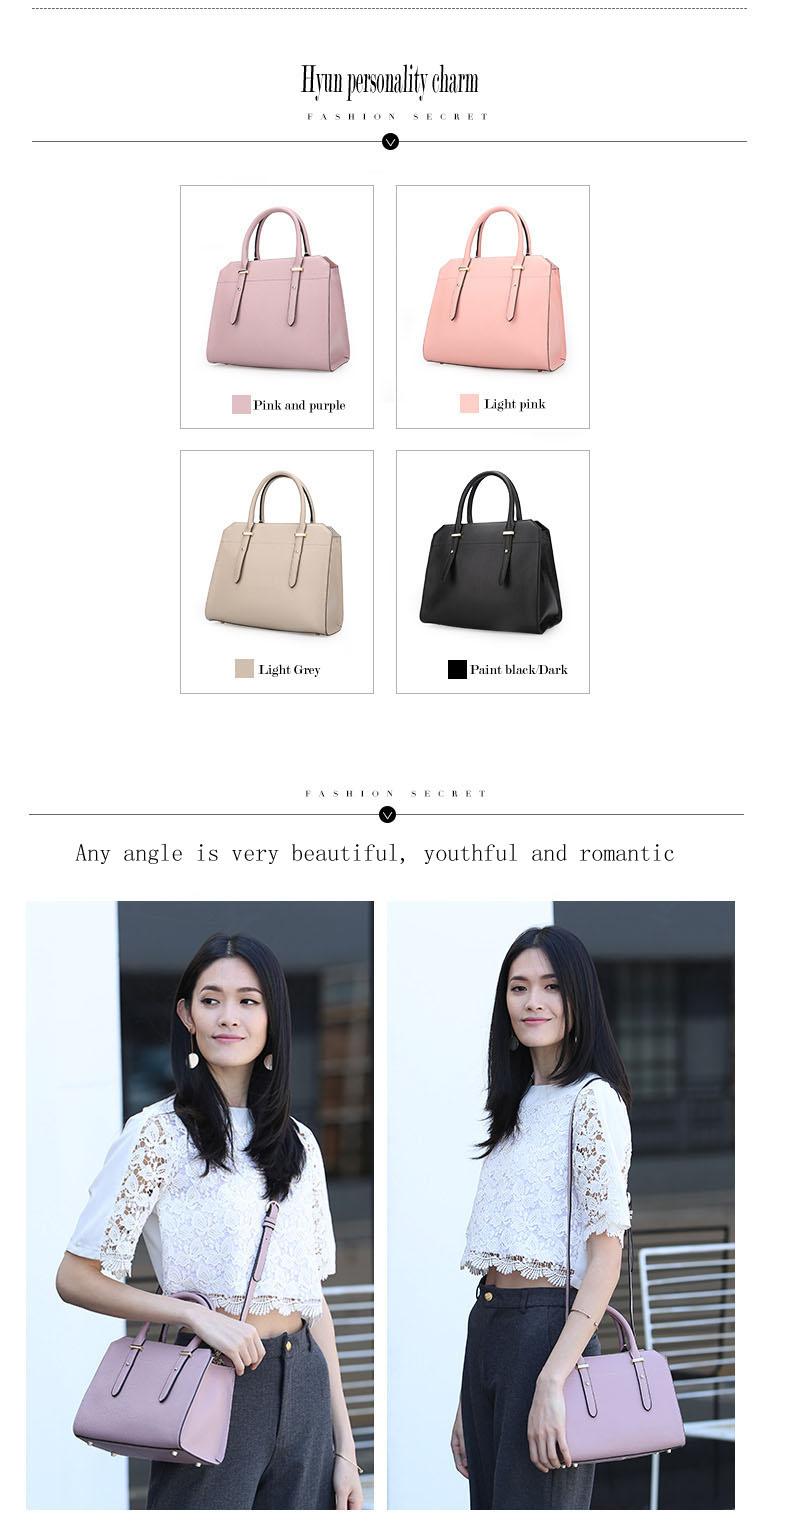 Famous luxury Brands Women Genuine Leather Bag Ladies Tote Embossed leather Boston handbags 2017 Fashion Female Versatile BagH51340227 (4)111